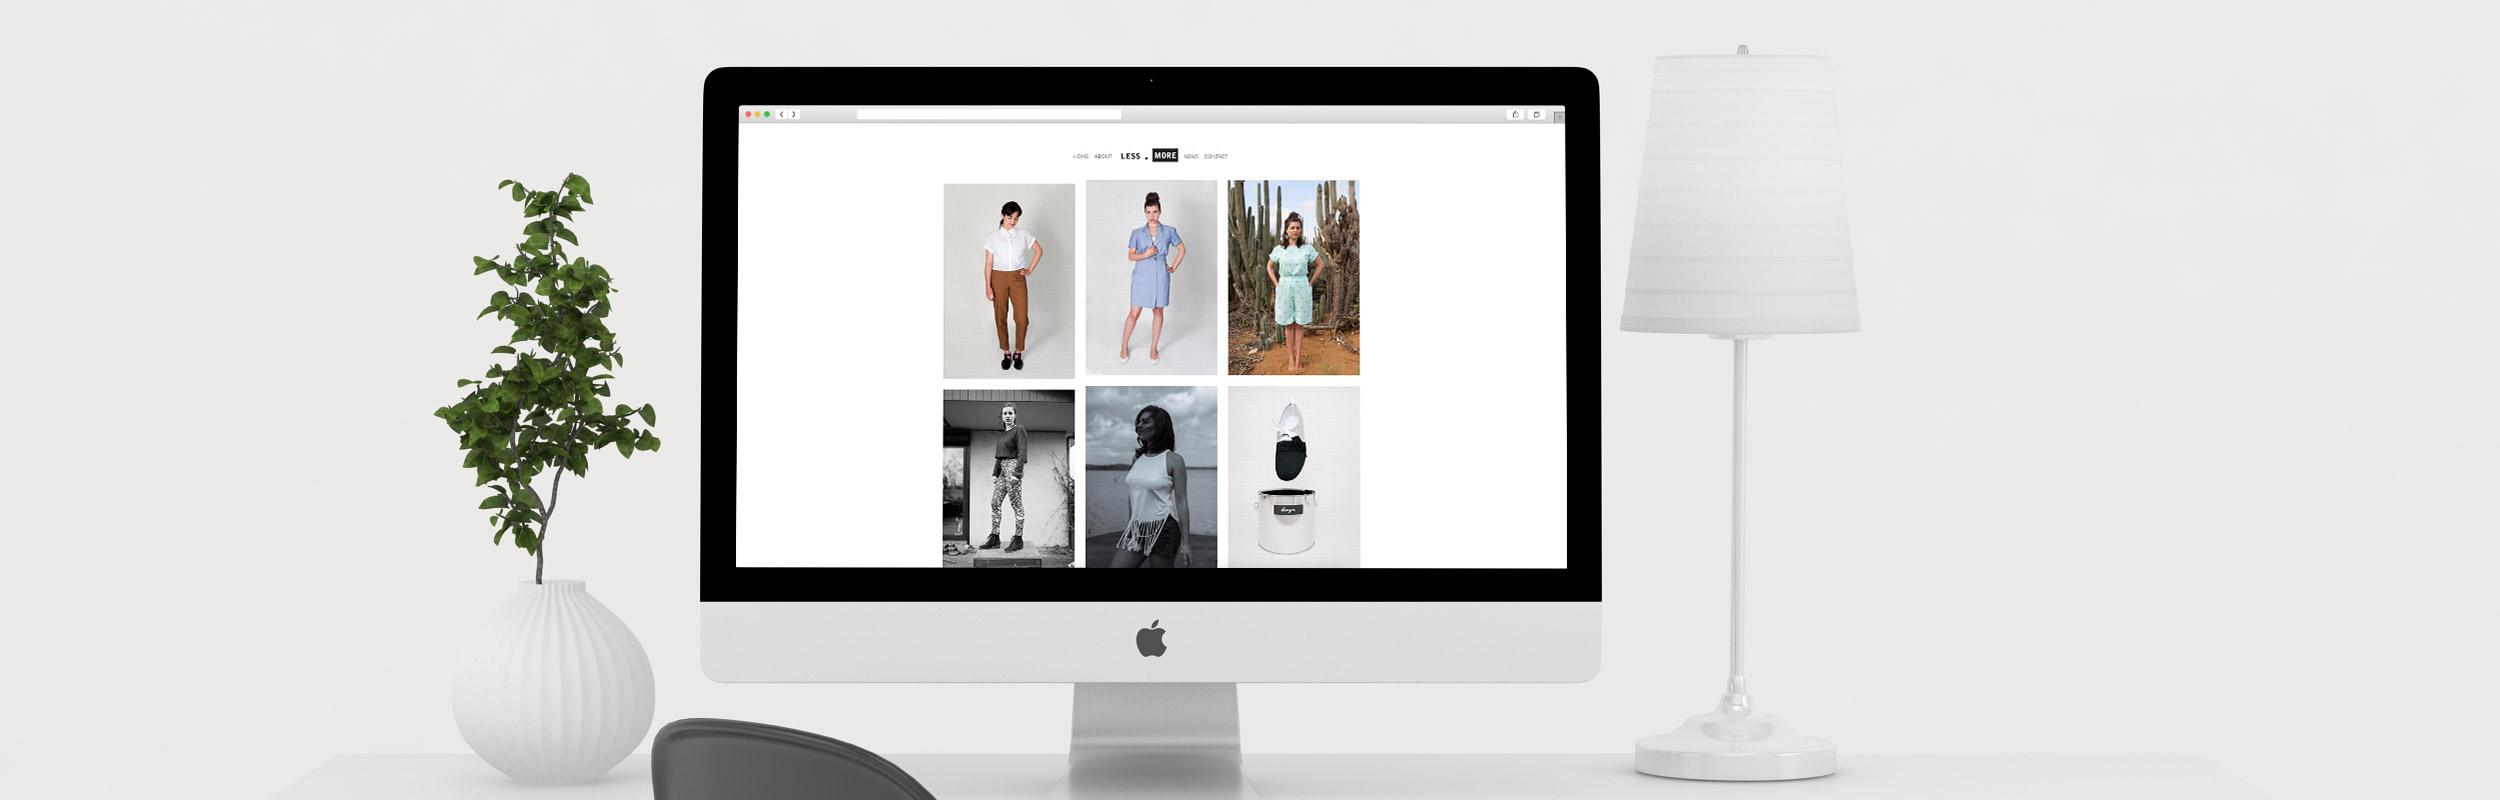 Design-Webdesign-LESS